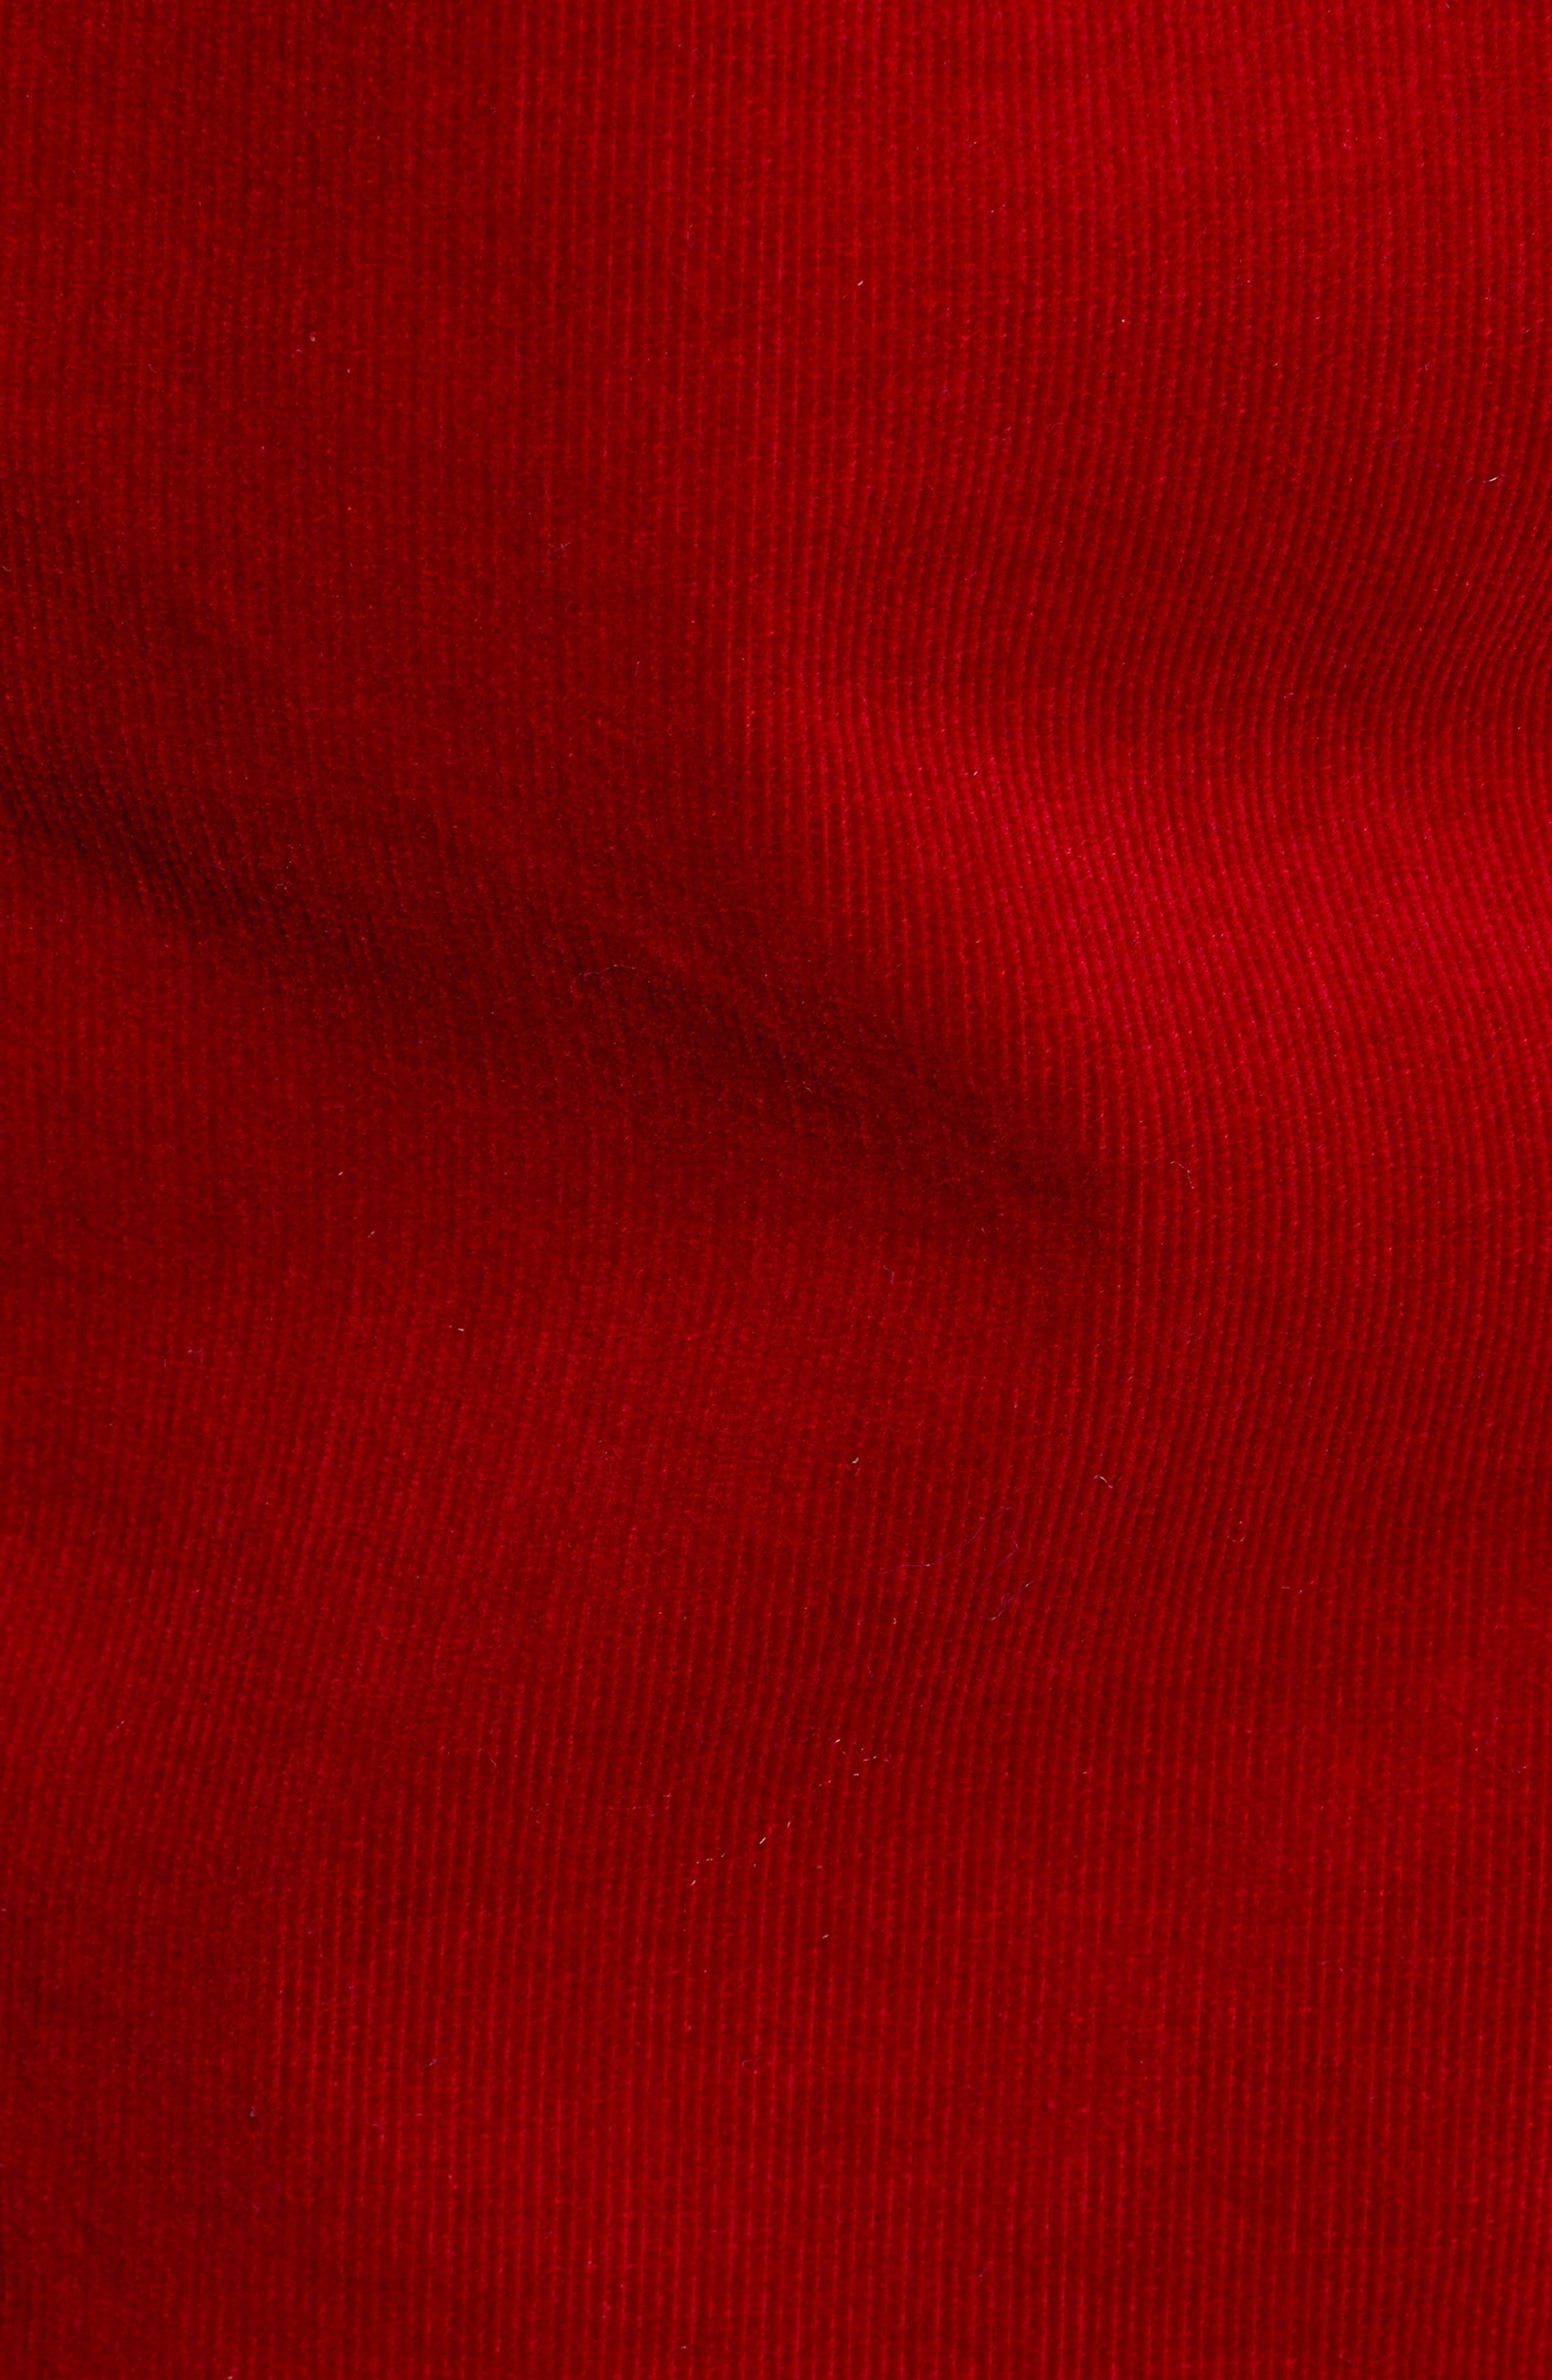 Robyn Corduroy Jacket,                             Alternate thumbnail 7, color,                             RED AMARYLLIS